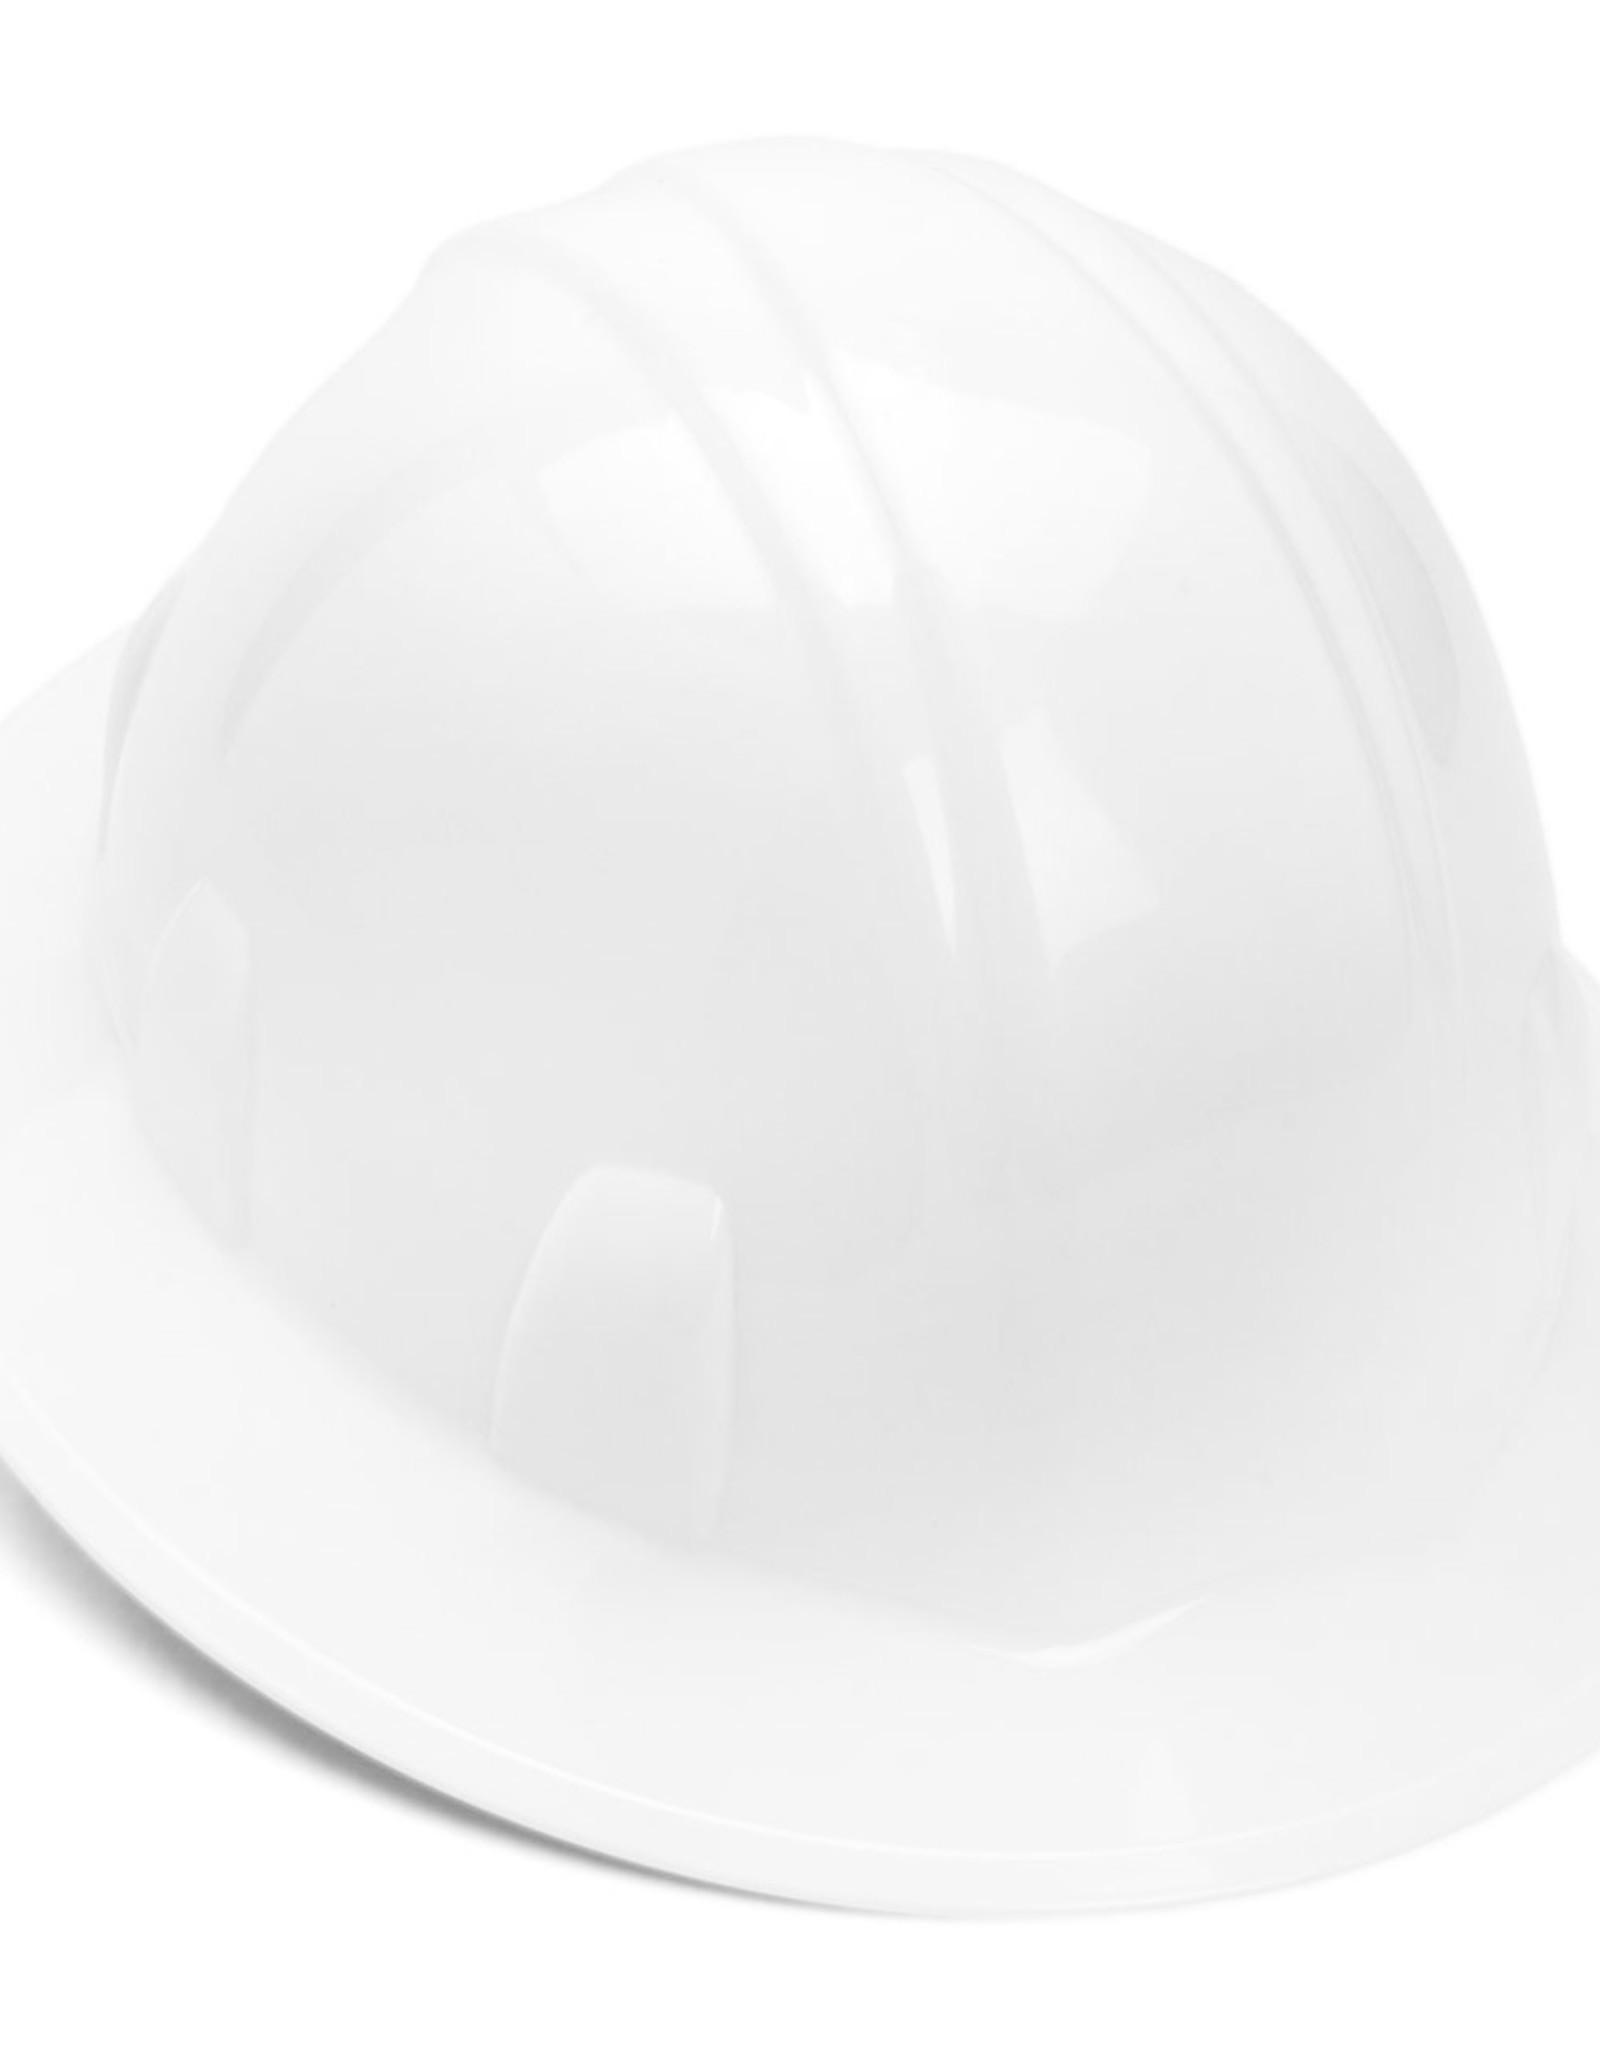 Pyramex Pyramex White Full Brim Hard Hat 4pt rachet